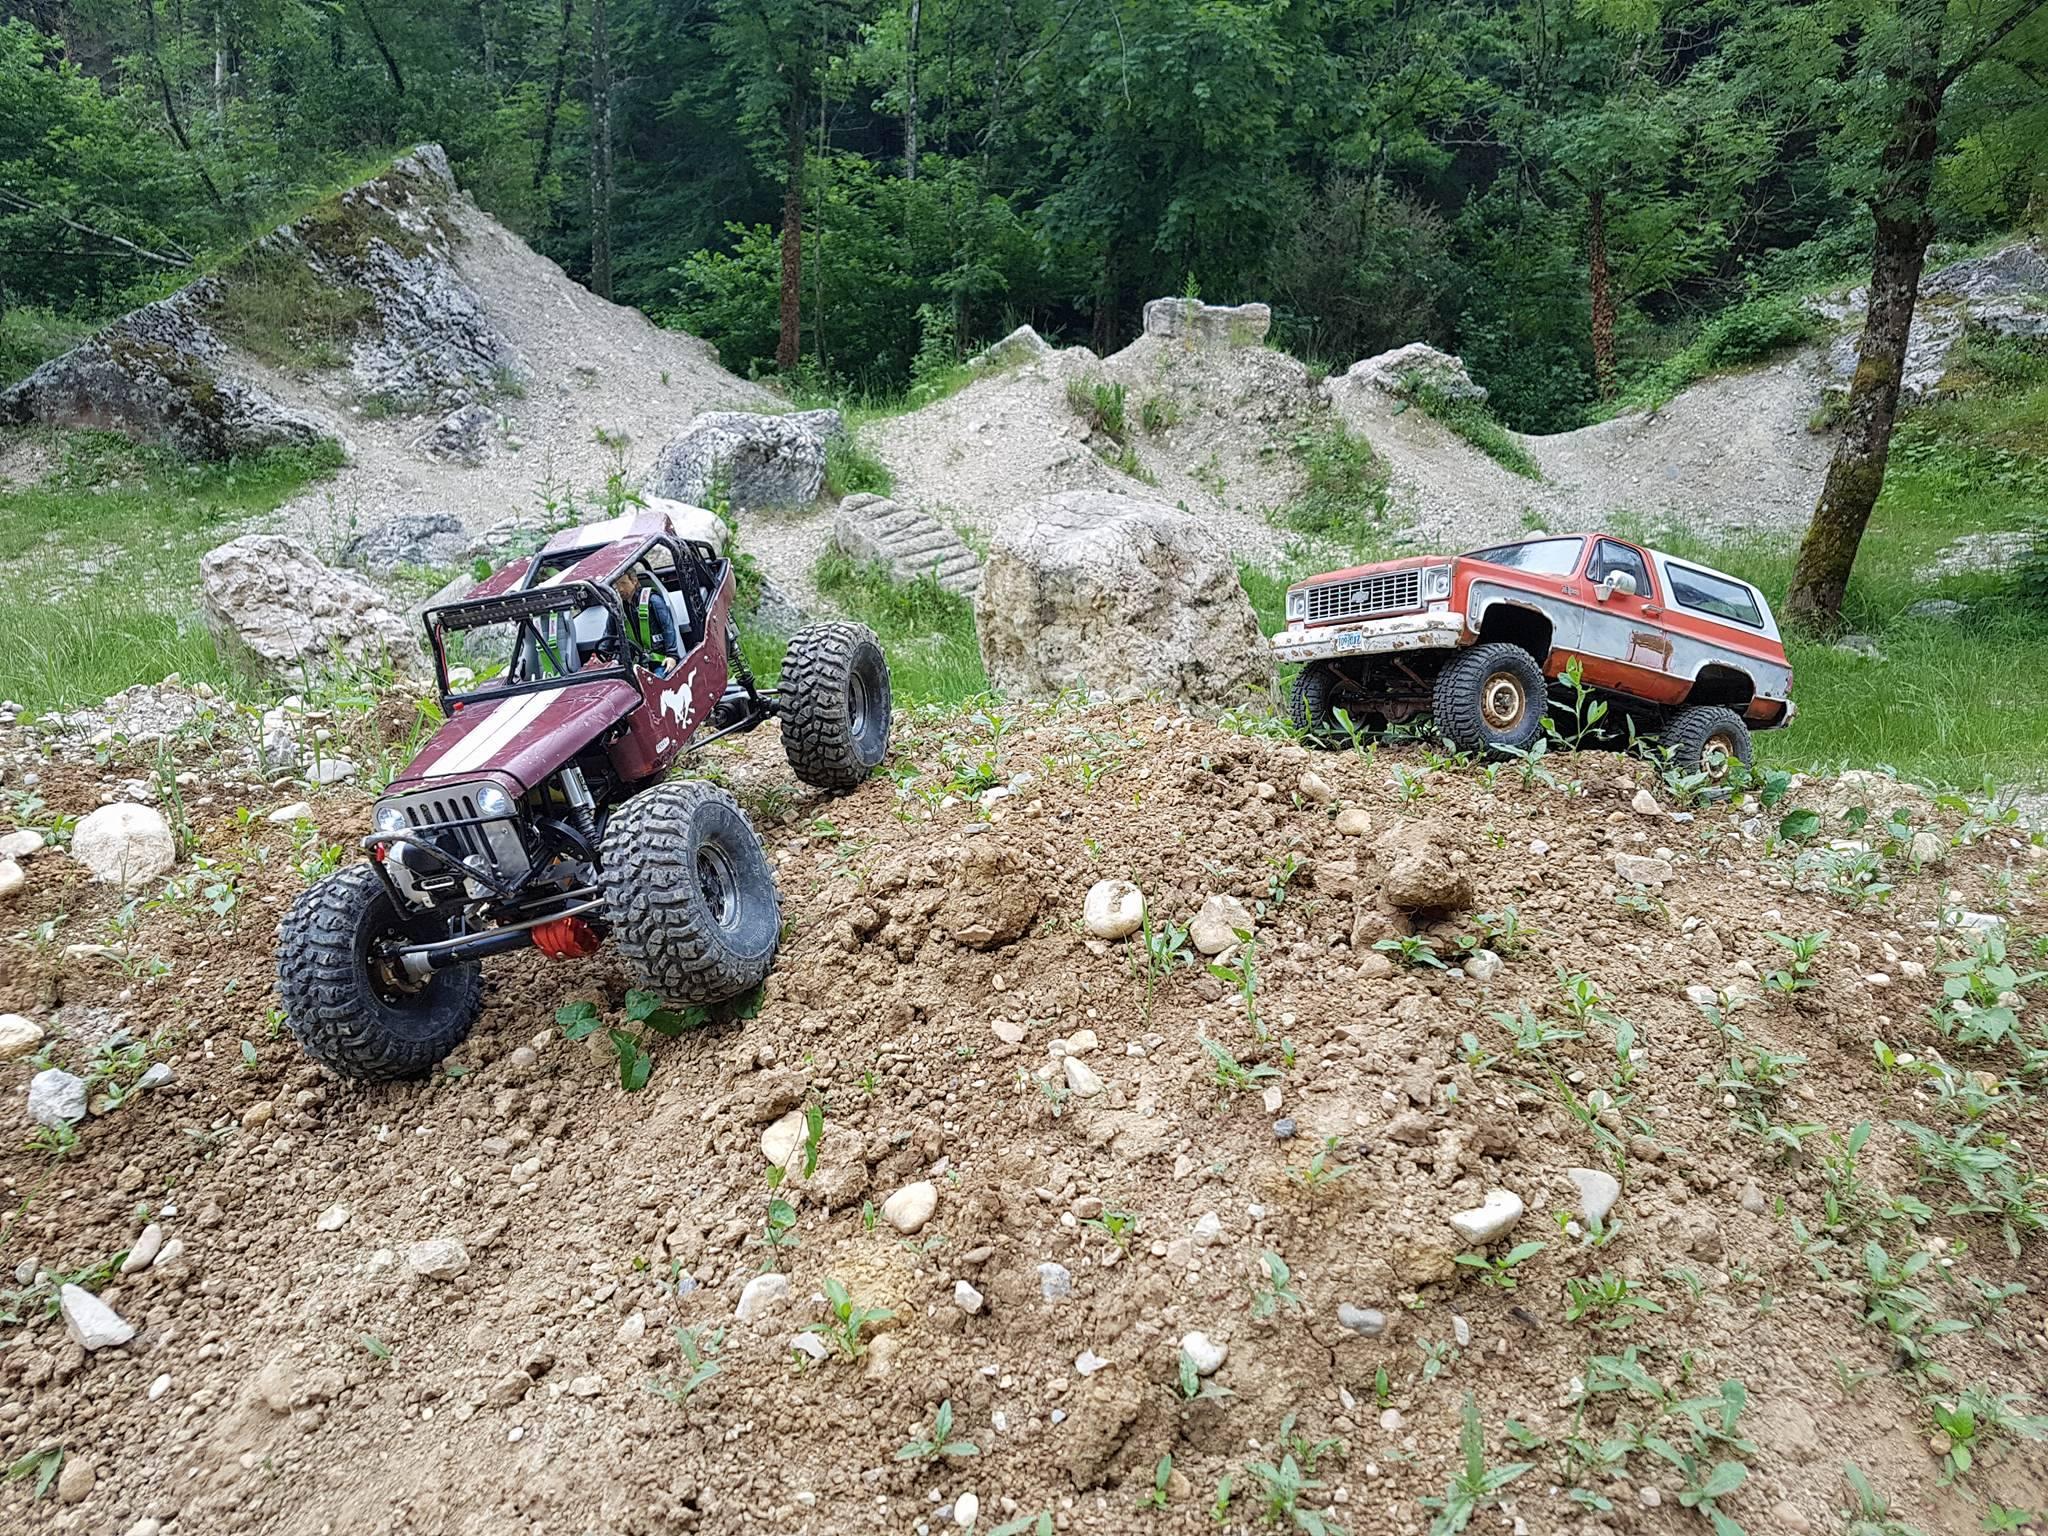 Farm Truck Chevrolet Blazer K5 sur TF2, Road Trip ! - Page 3 829453194023361303432353108638113152316o